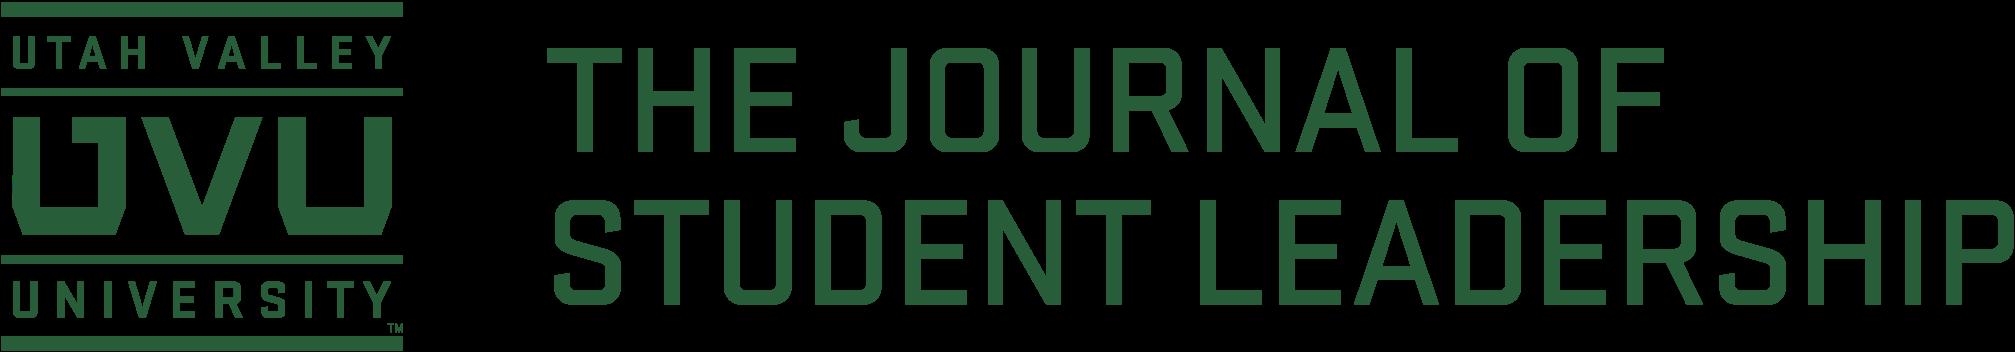 Journal of Student Leadership